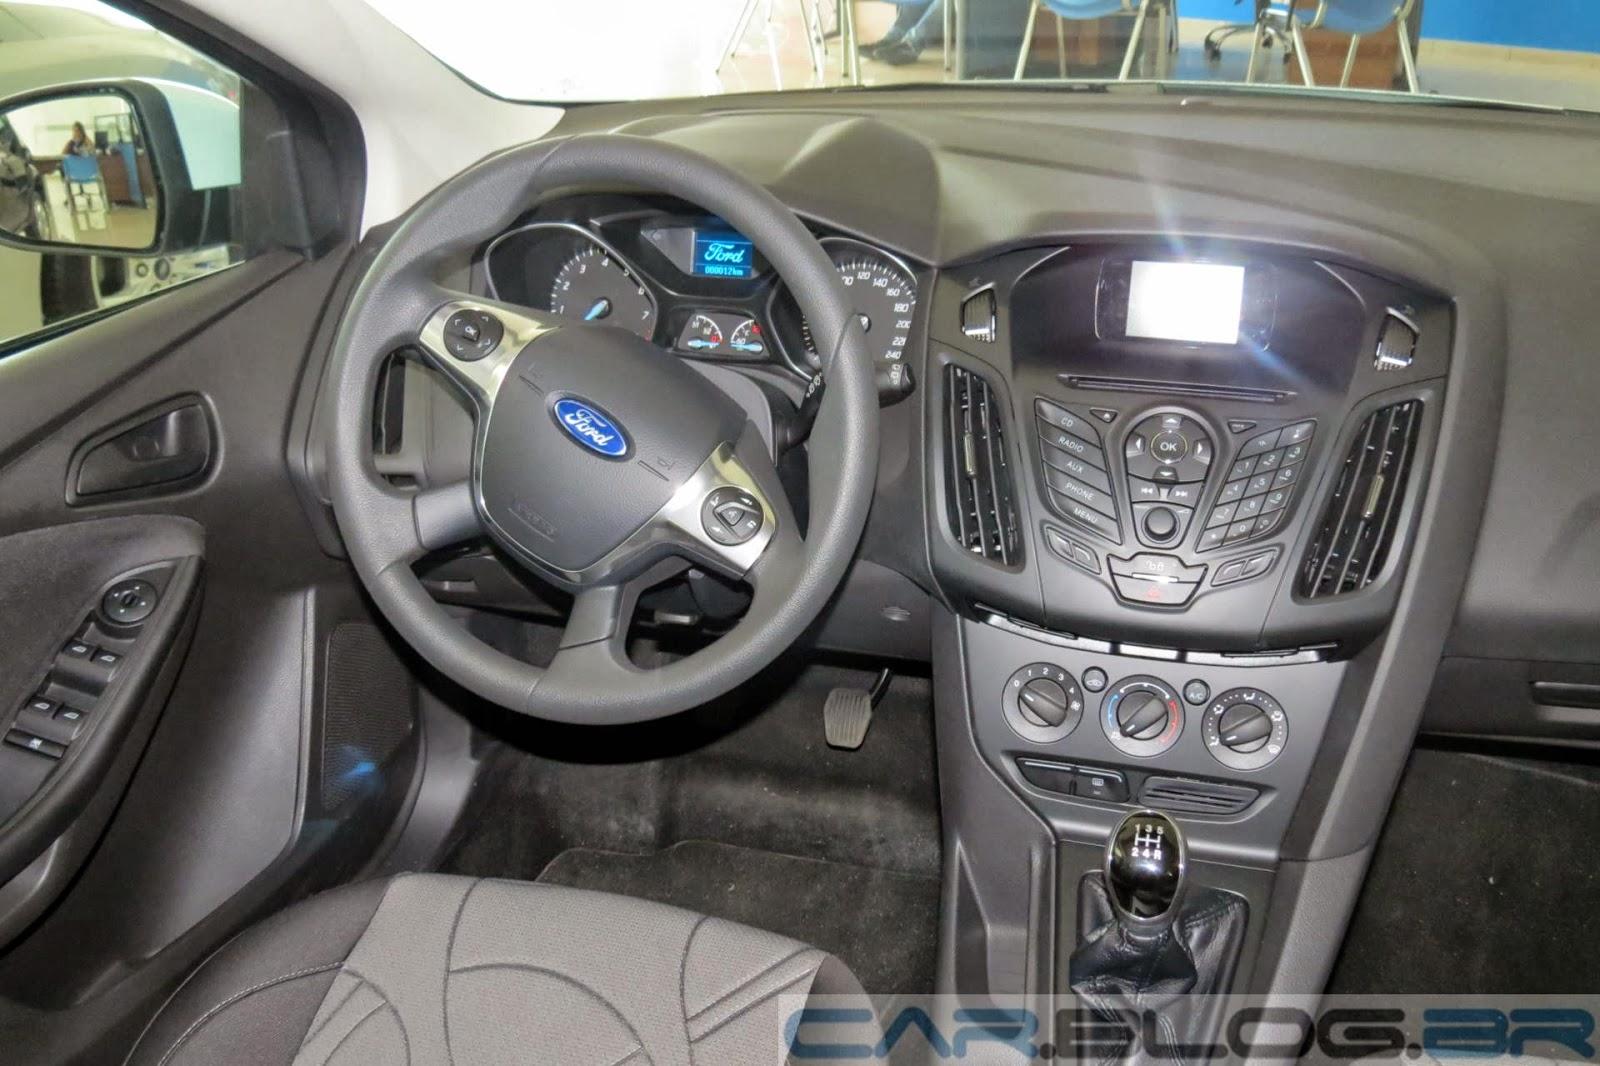 Focus Hatch S 1 6 Fotos E V 237 Deo Da Vers 227 O De R 61 Mil